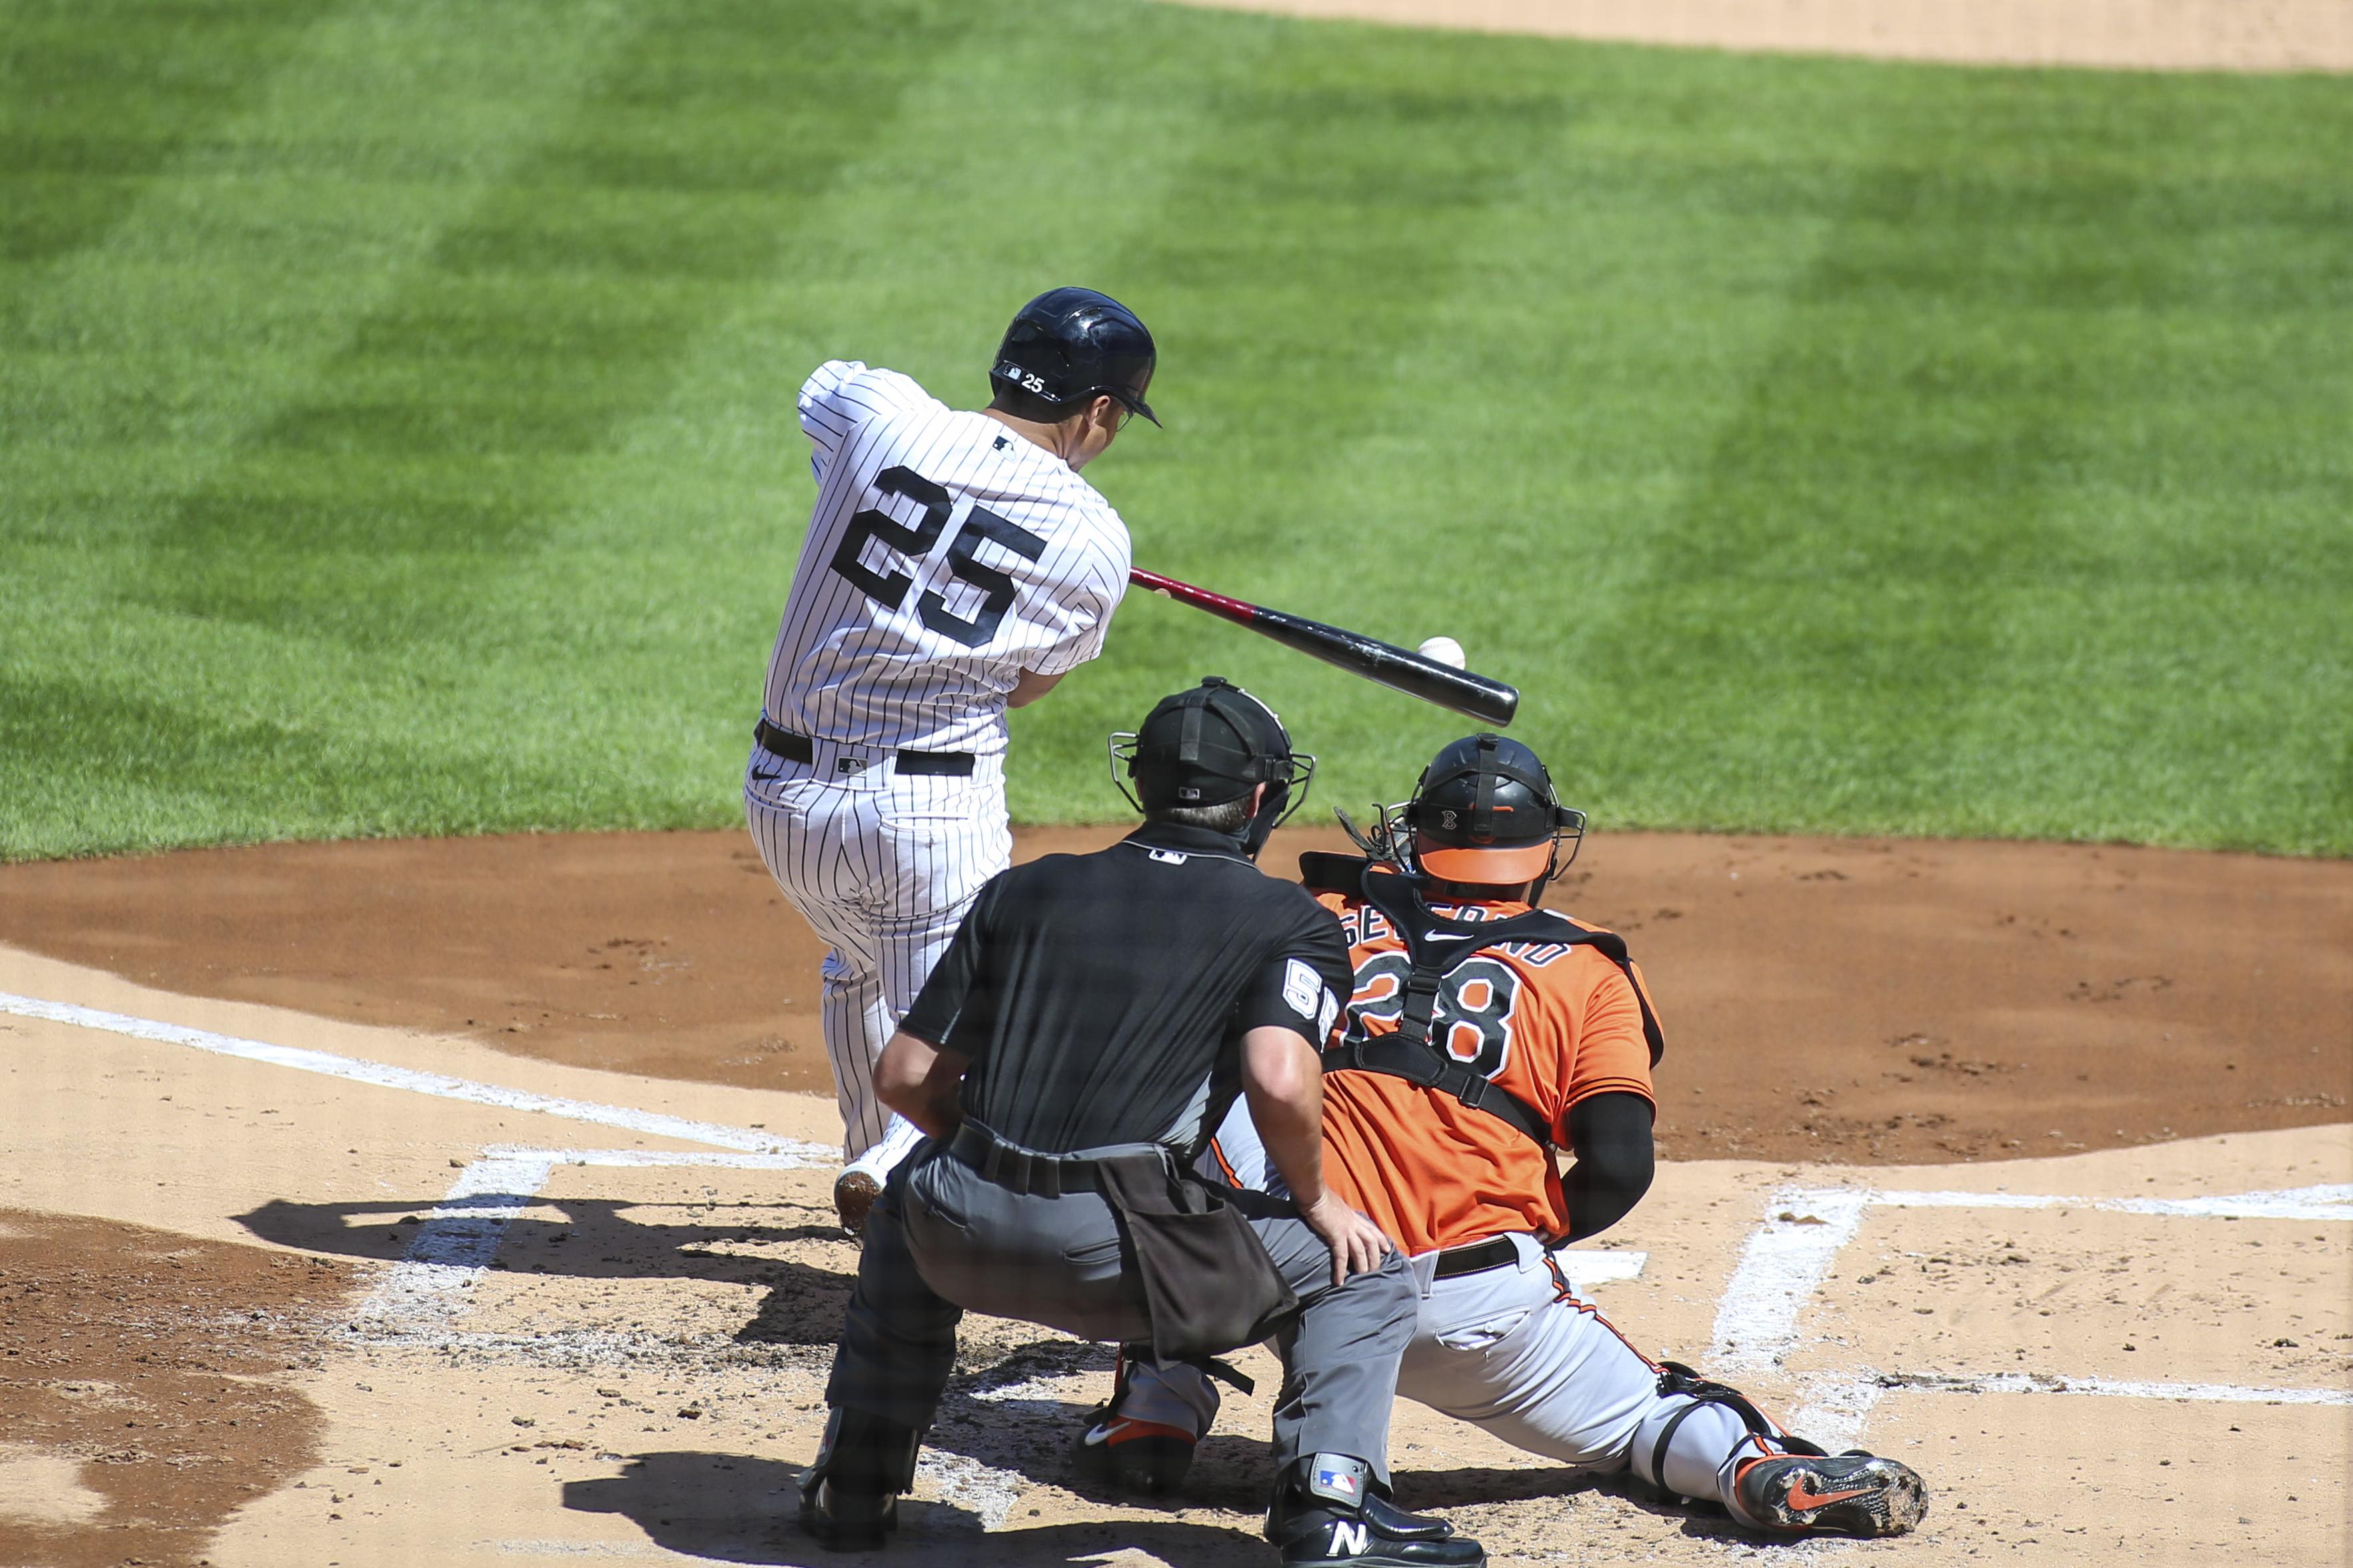 MLB: Baltimore Orioles at New York Yankees